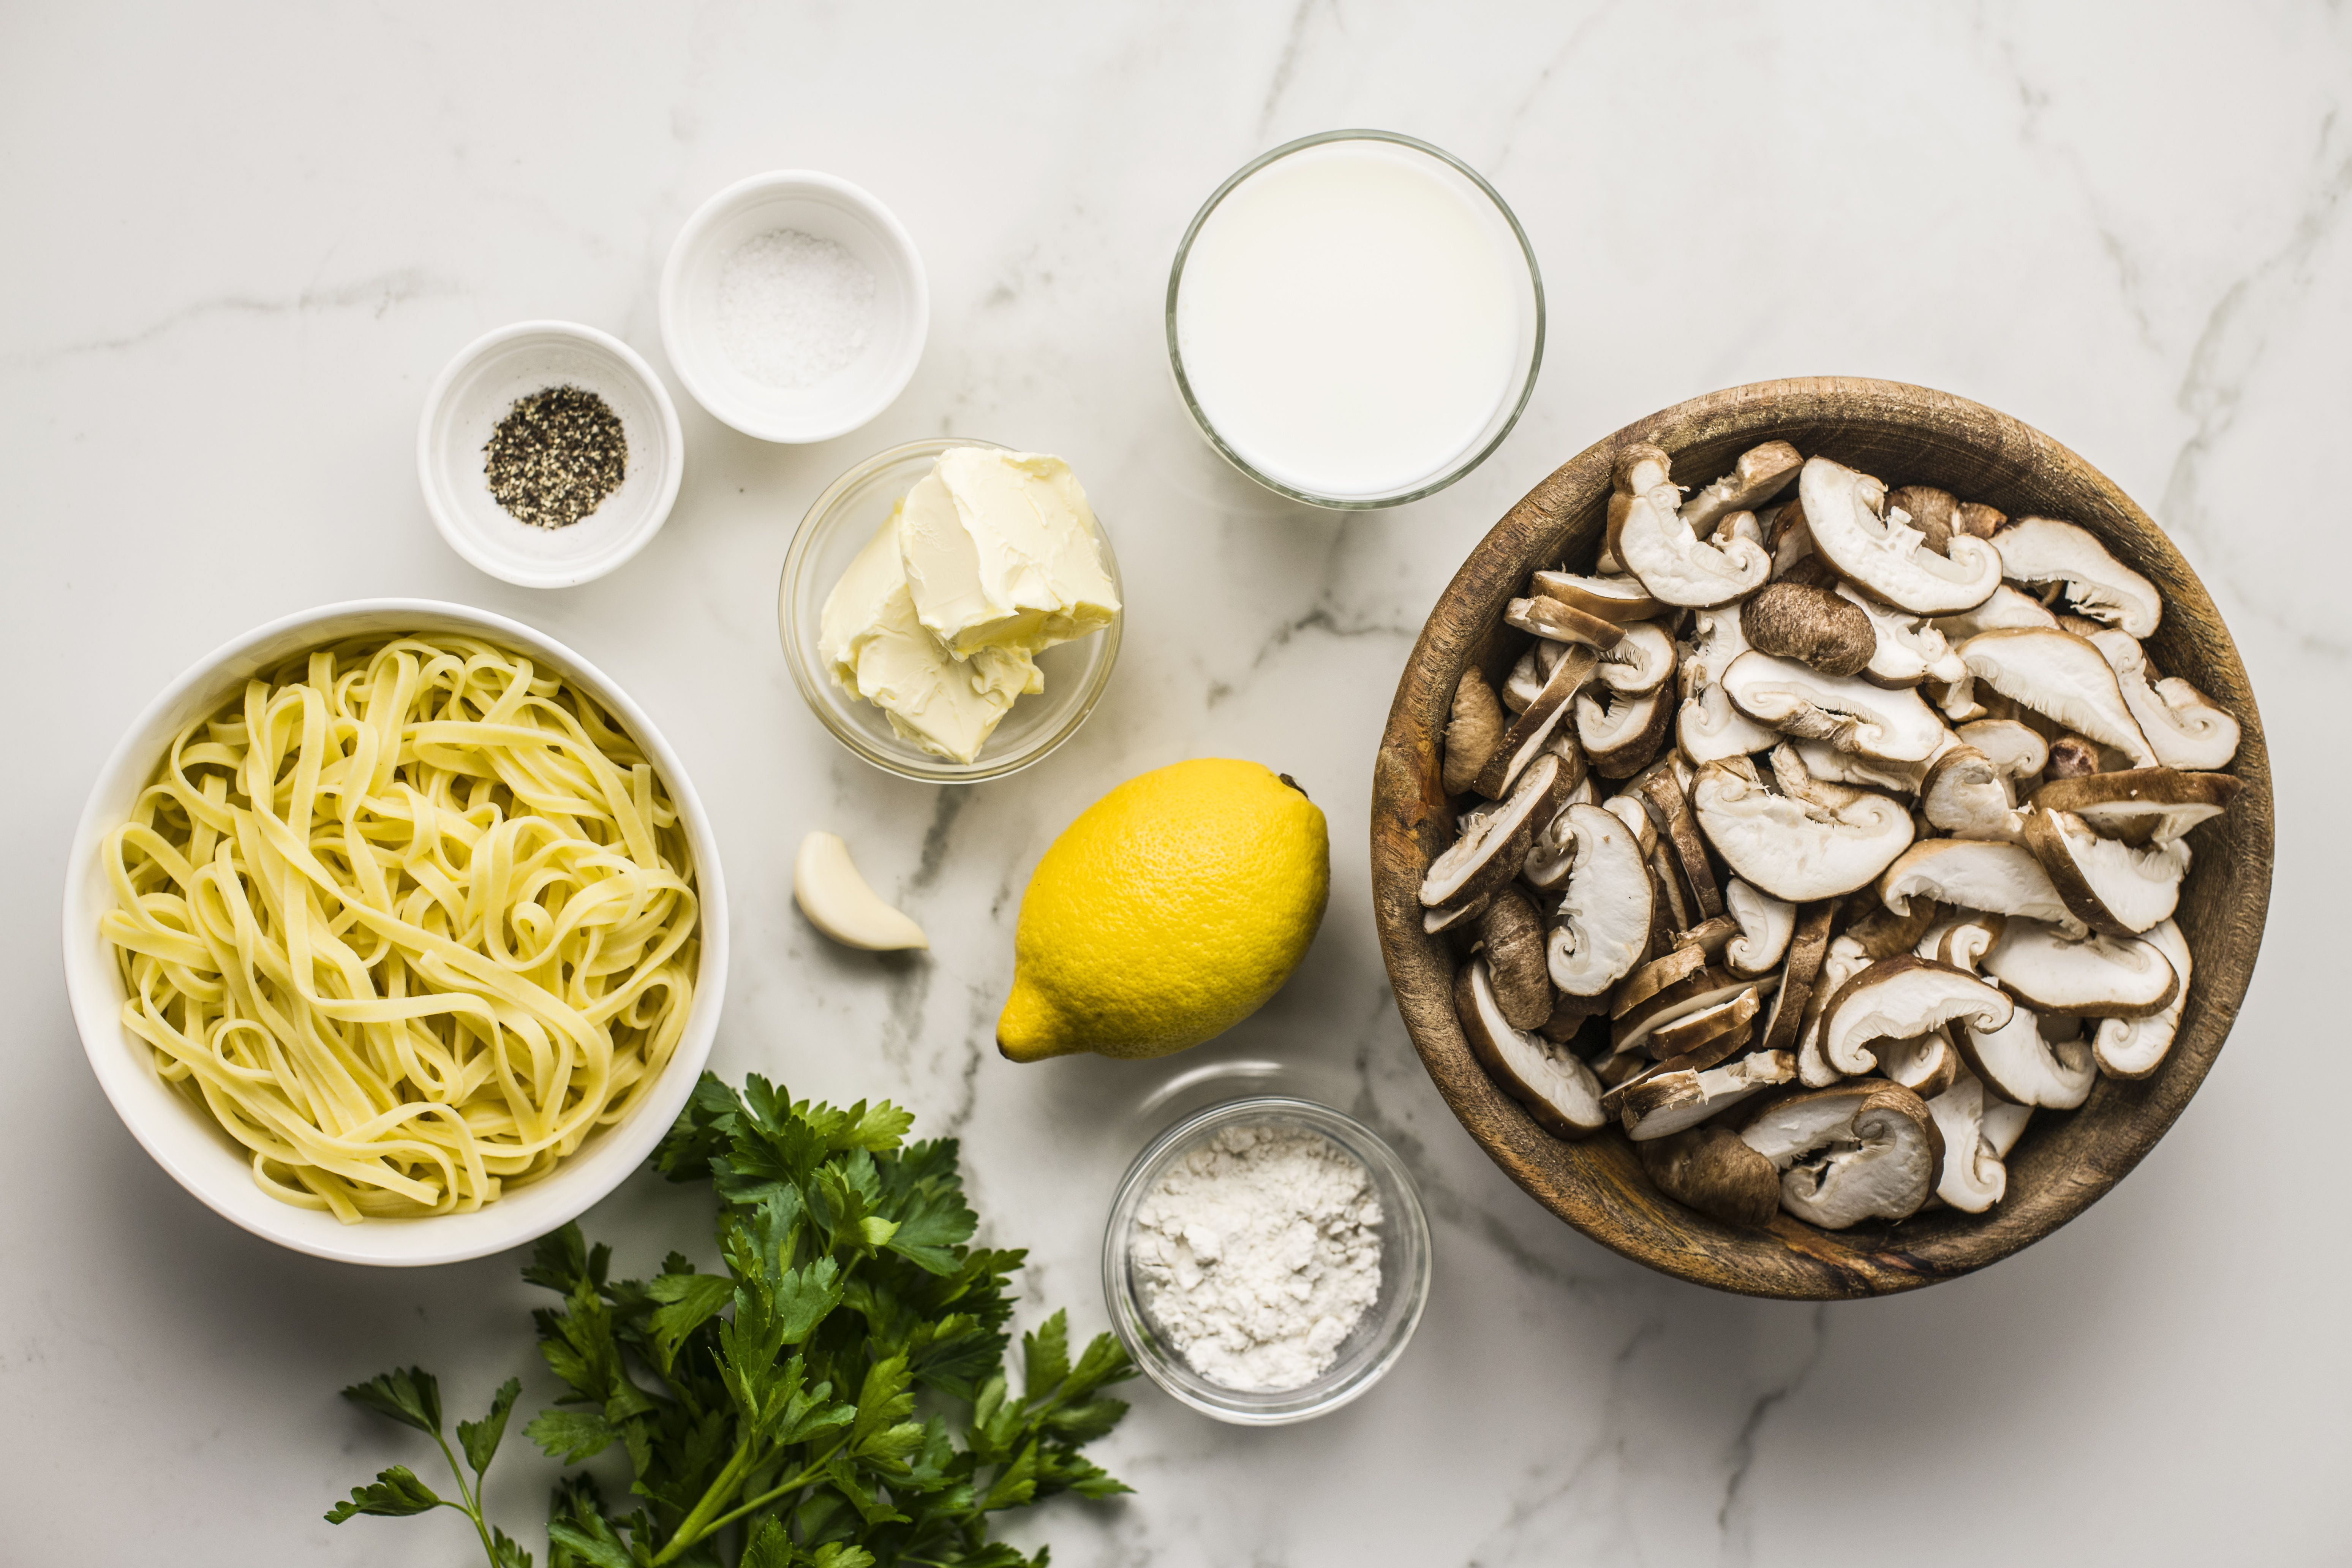 Ingredients for vegan mushroom cream sauce